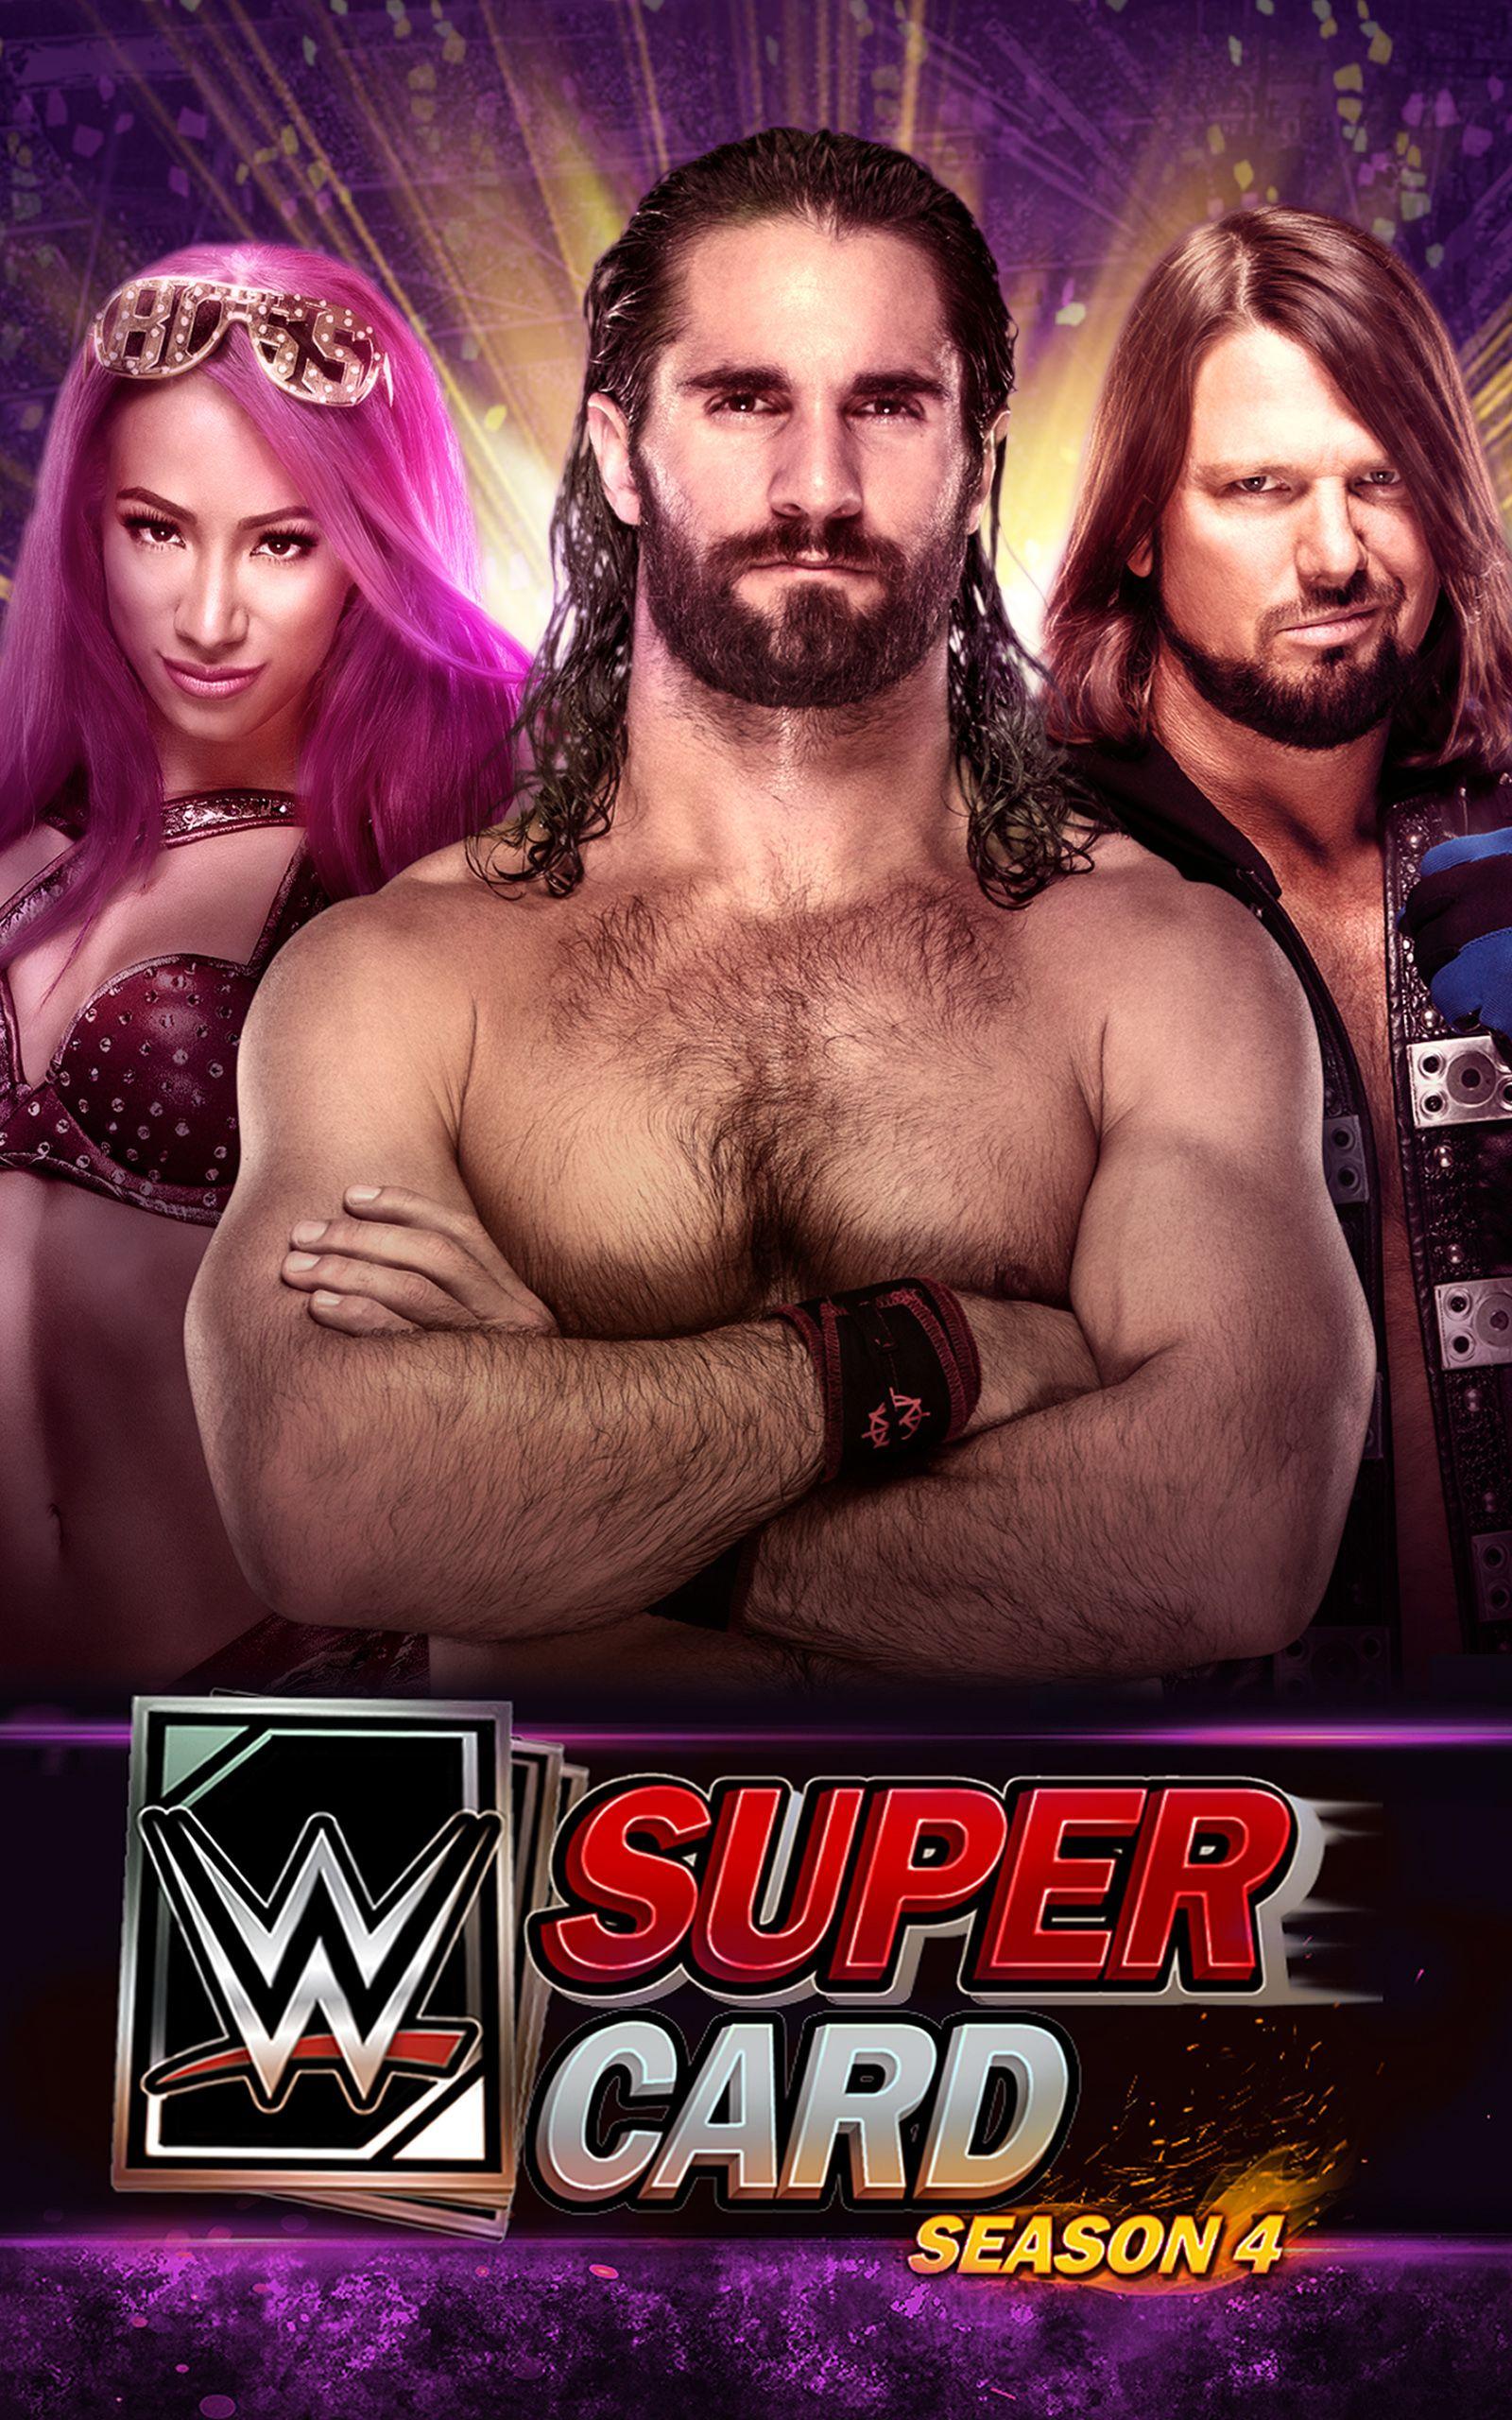 WWE SuperCard WWE, SuperCard Wwe, Battle games, Game app